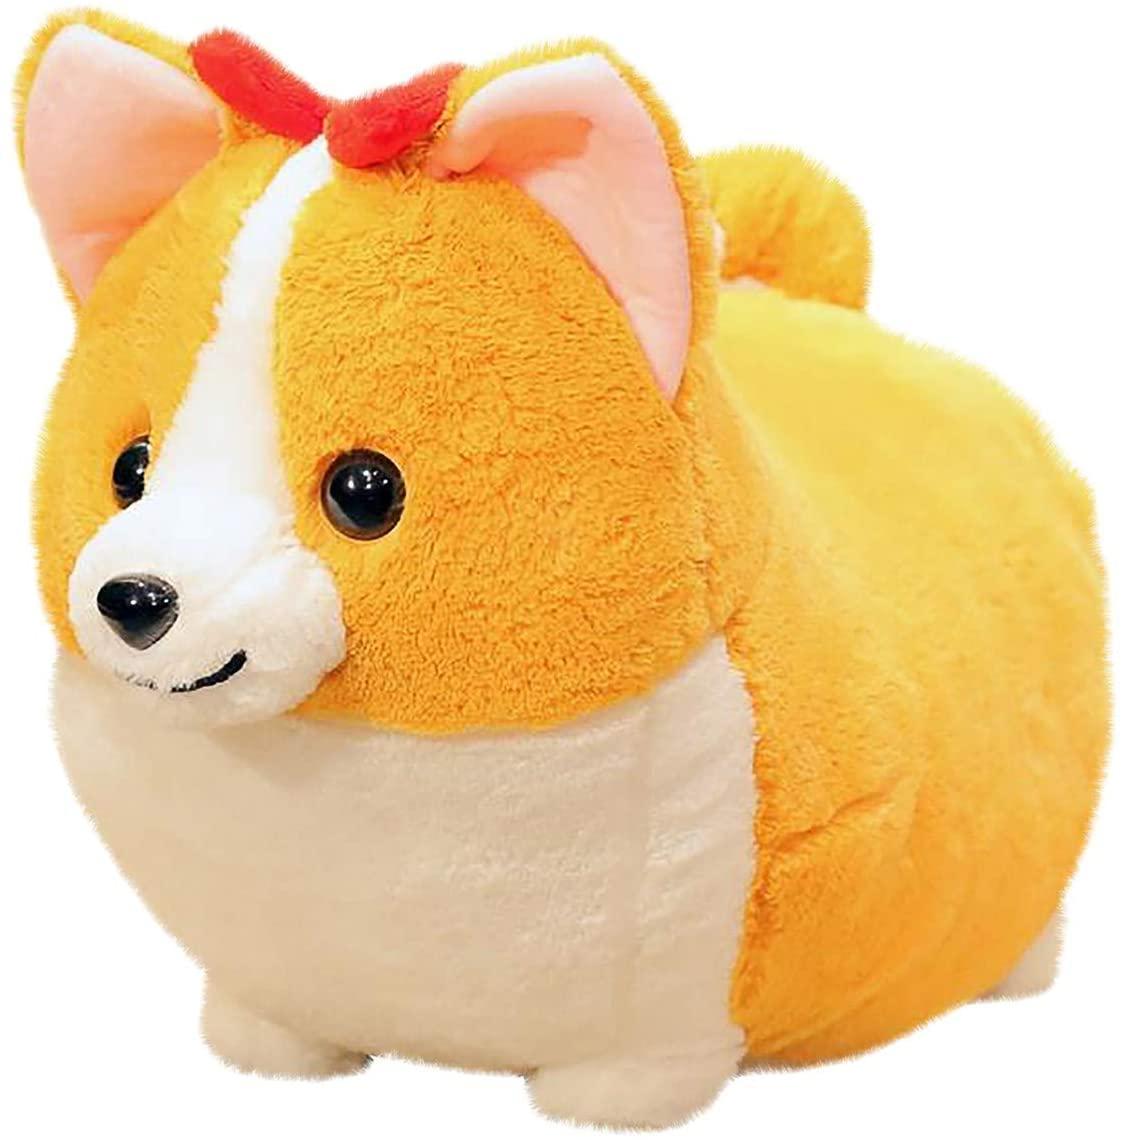 Bomden Cute Short-Legged Corgi Plush Doll Cute Short-Legged Corgi Doll Ornaments Fat Corgi Plush Toy Pillow Gift